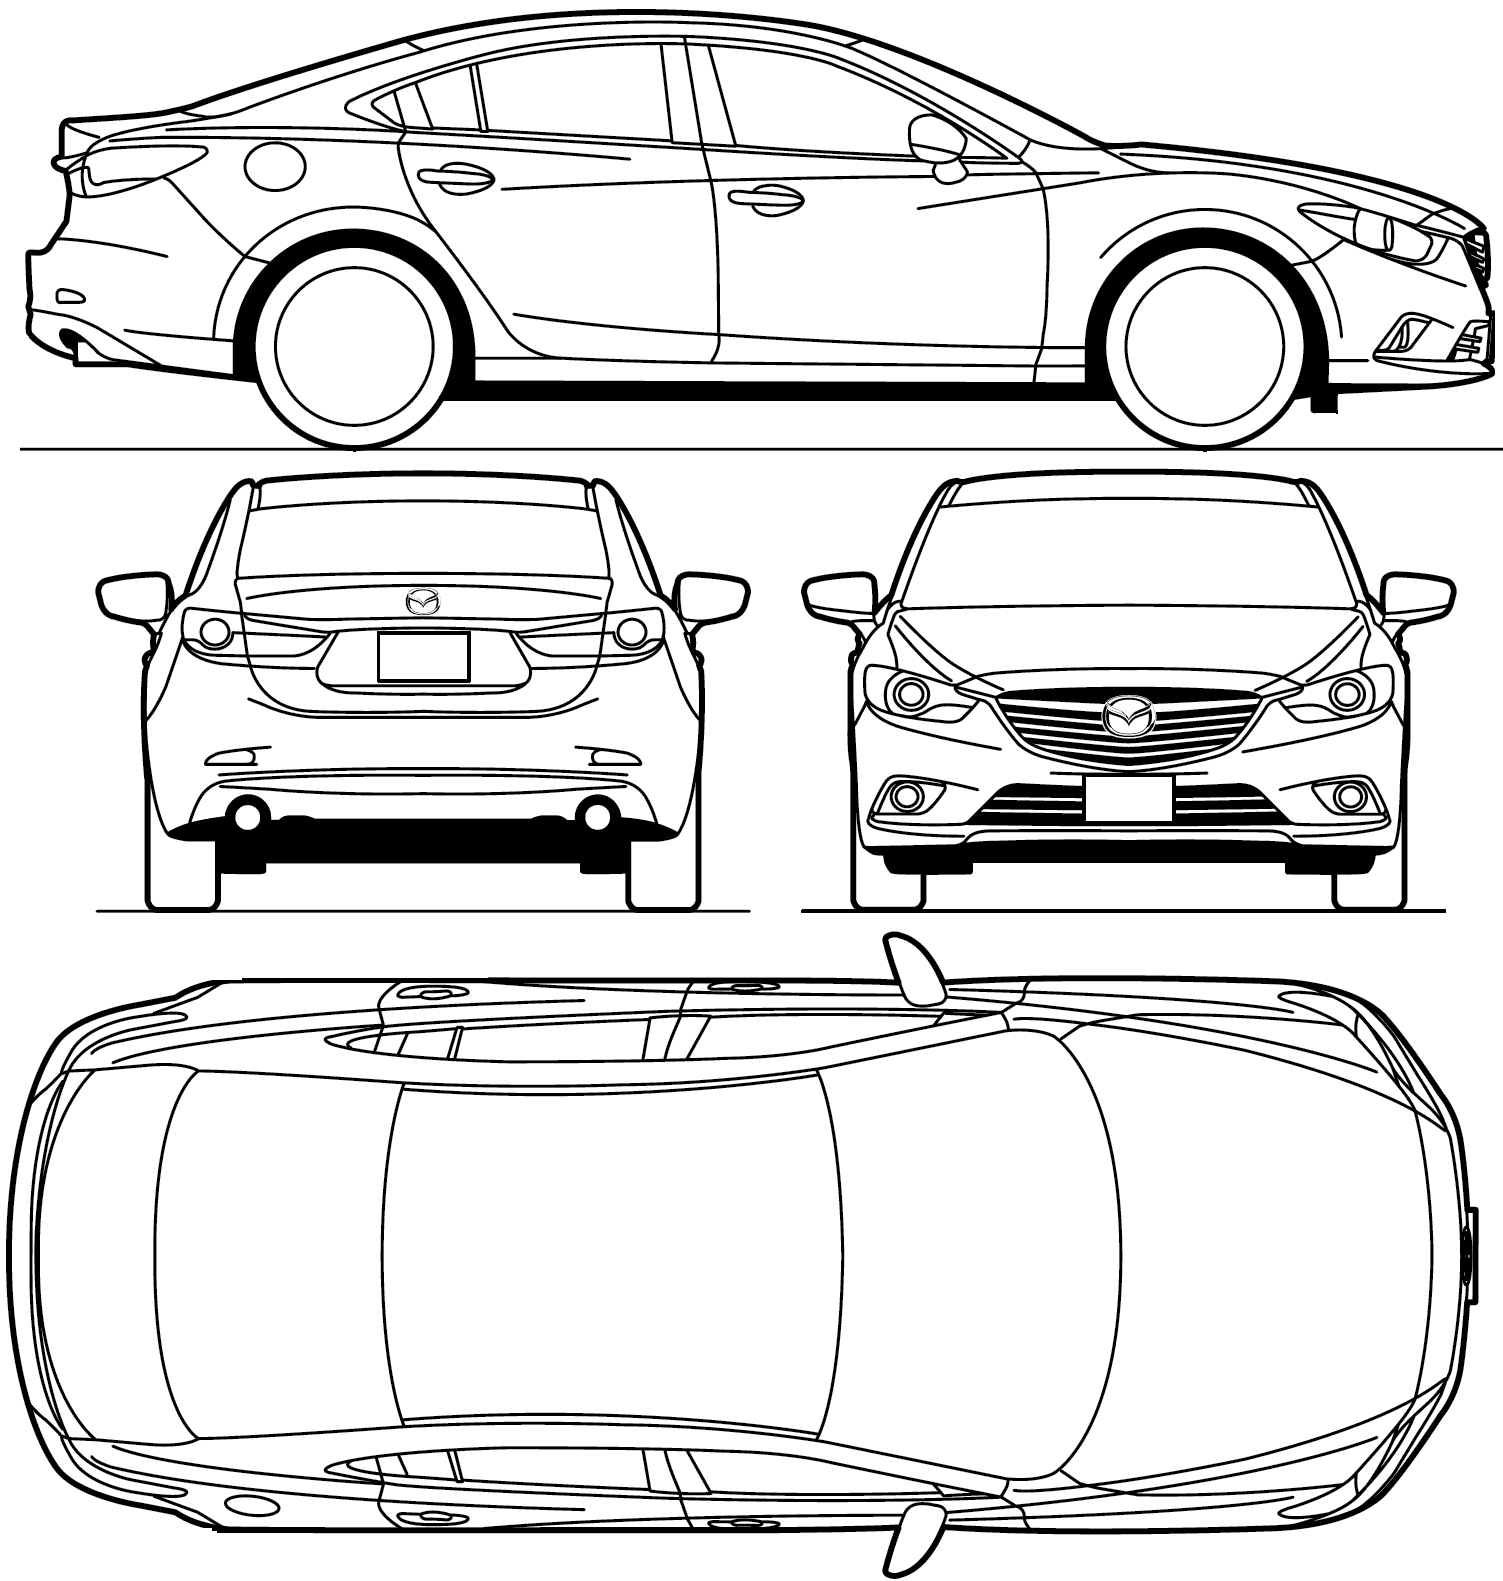 Mazda 6 blueprint